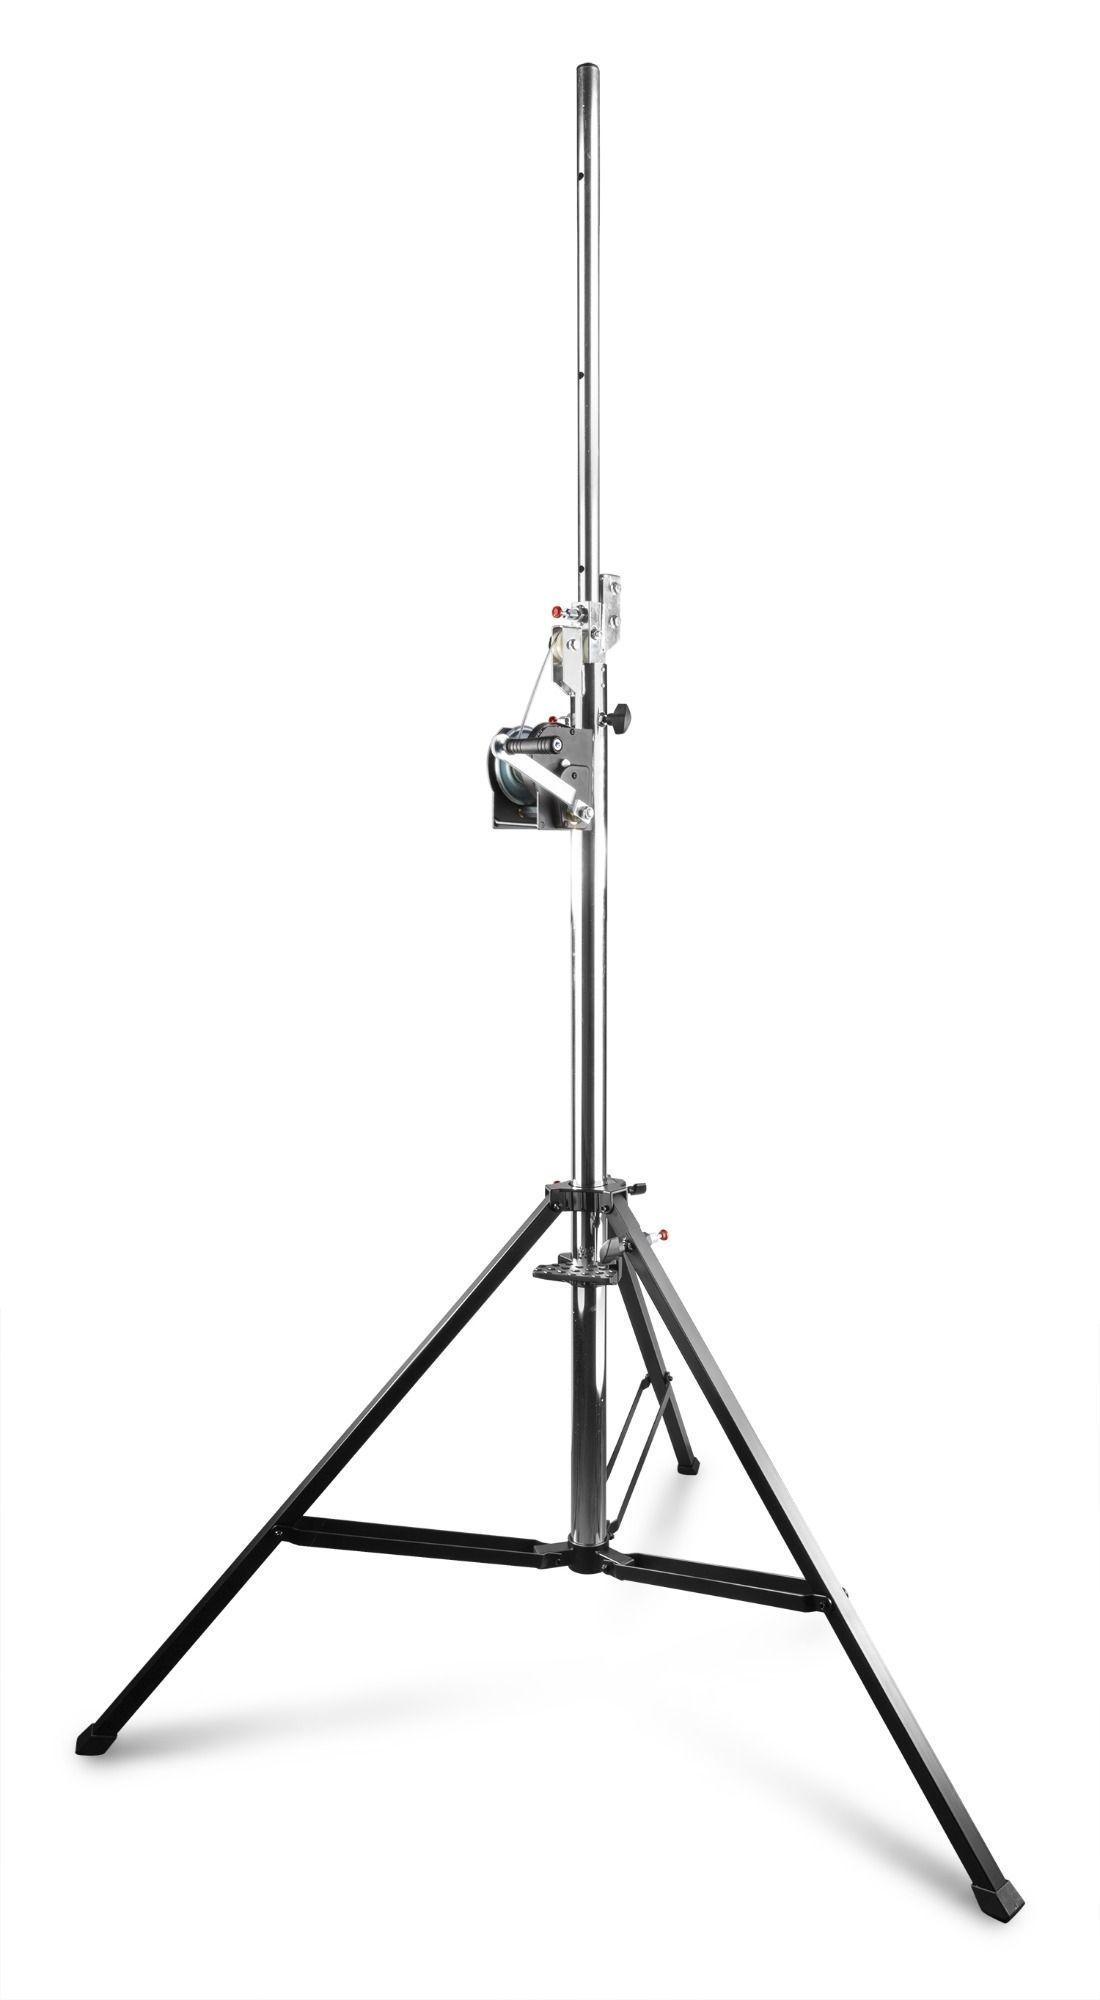 BeamZ WLS80 wind-up lichtstandaard - Hoogte 410cm max.